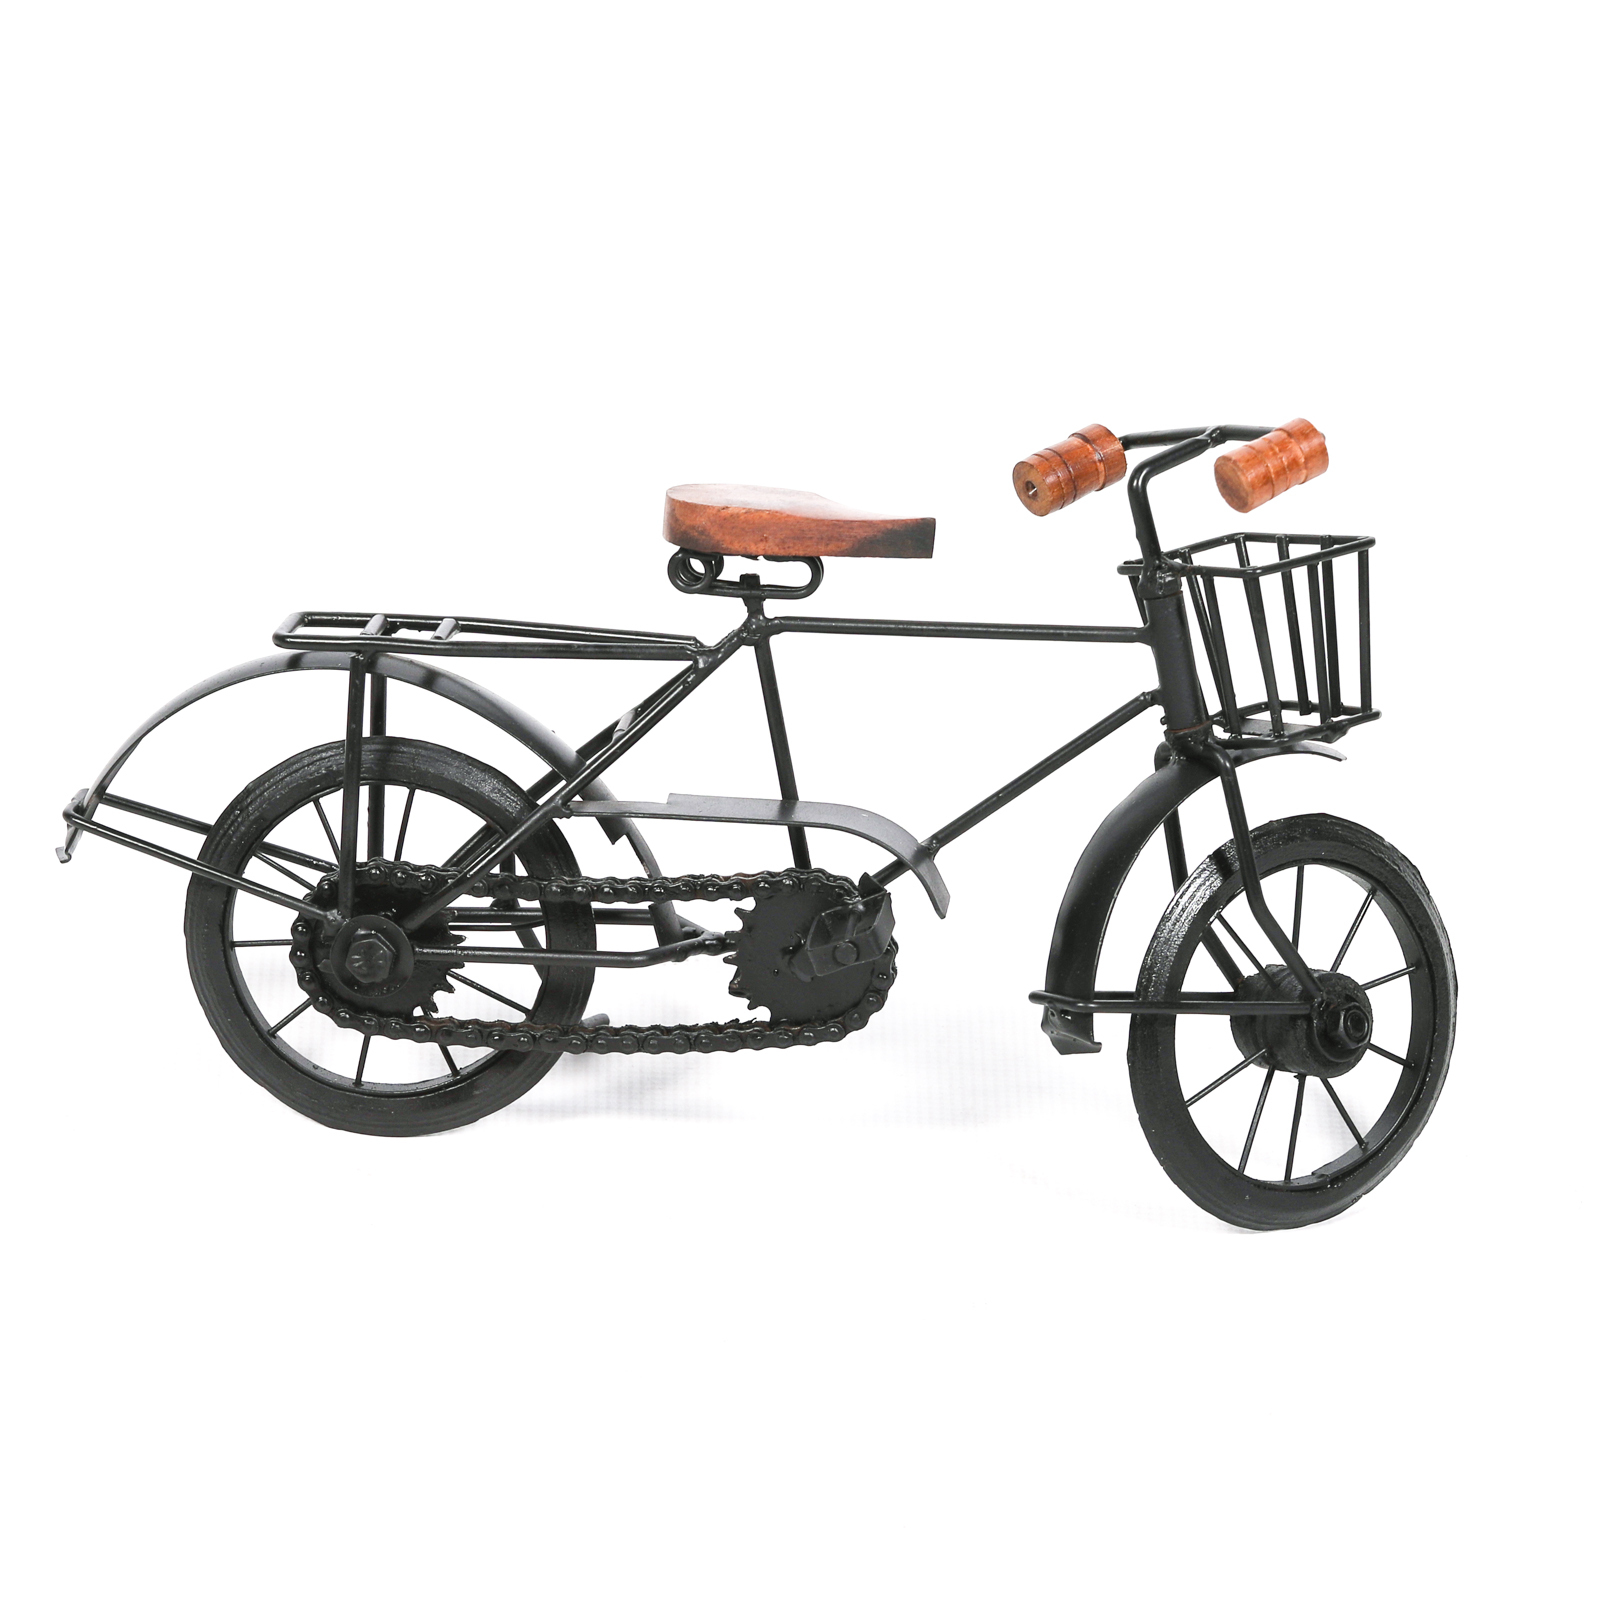 Iron Decorative Bicycle Ornament